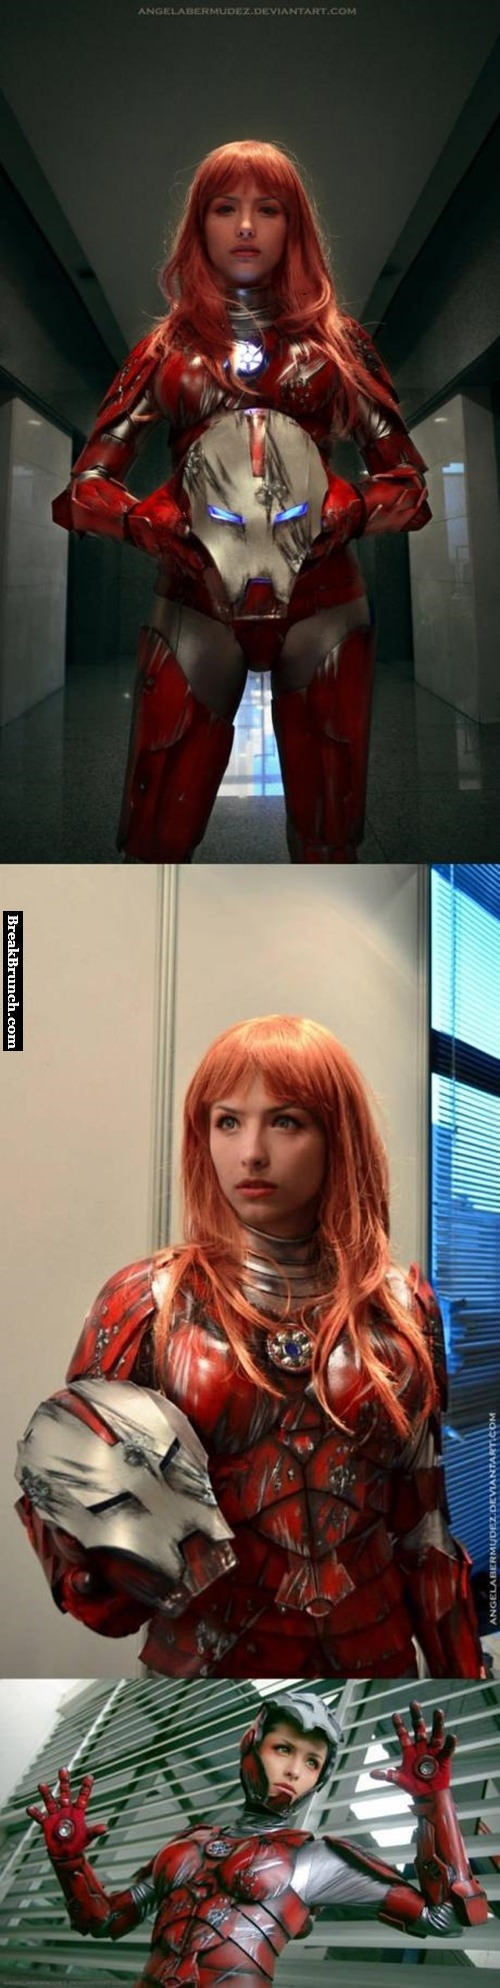 Pepper Potts cosplay